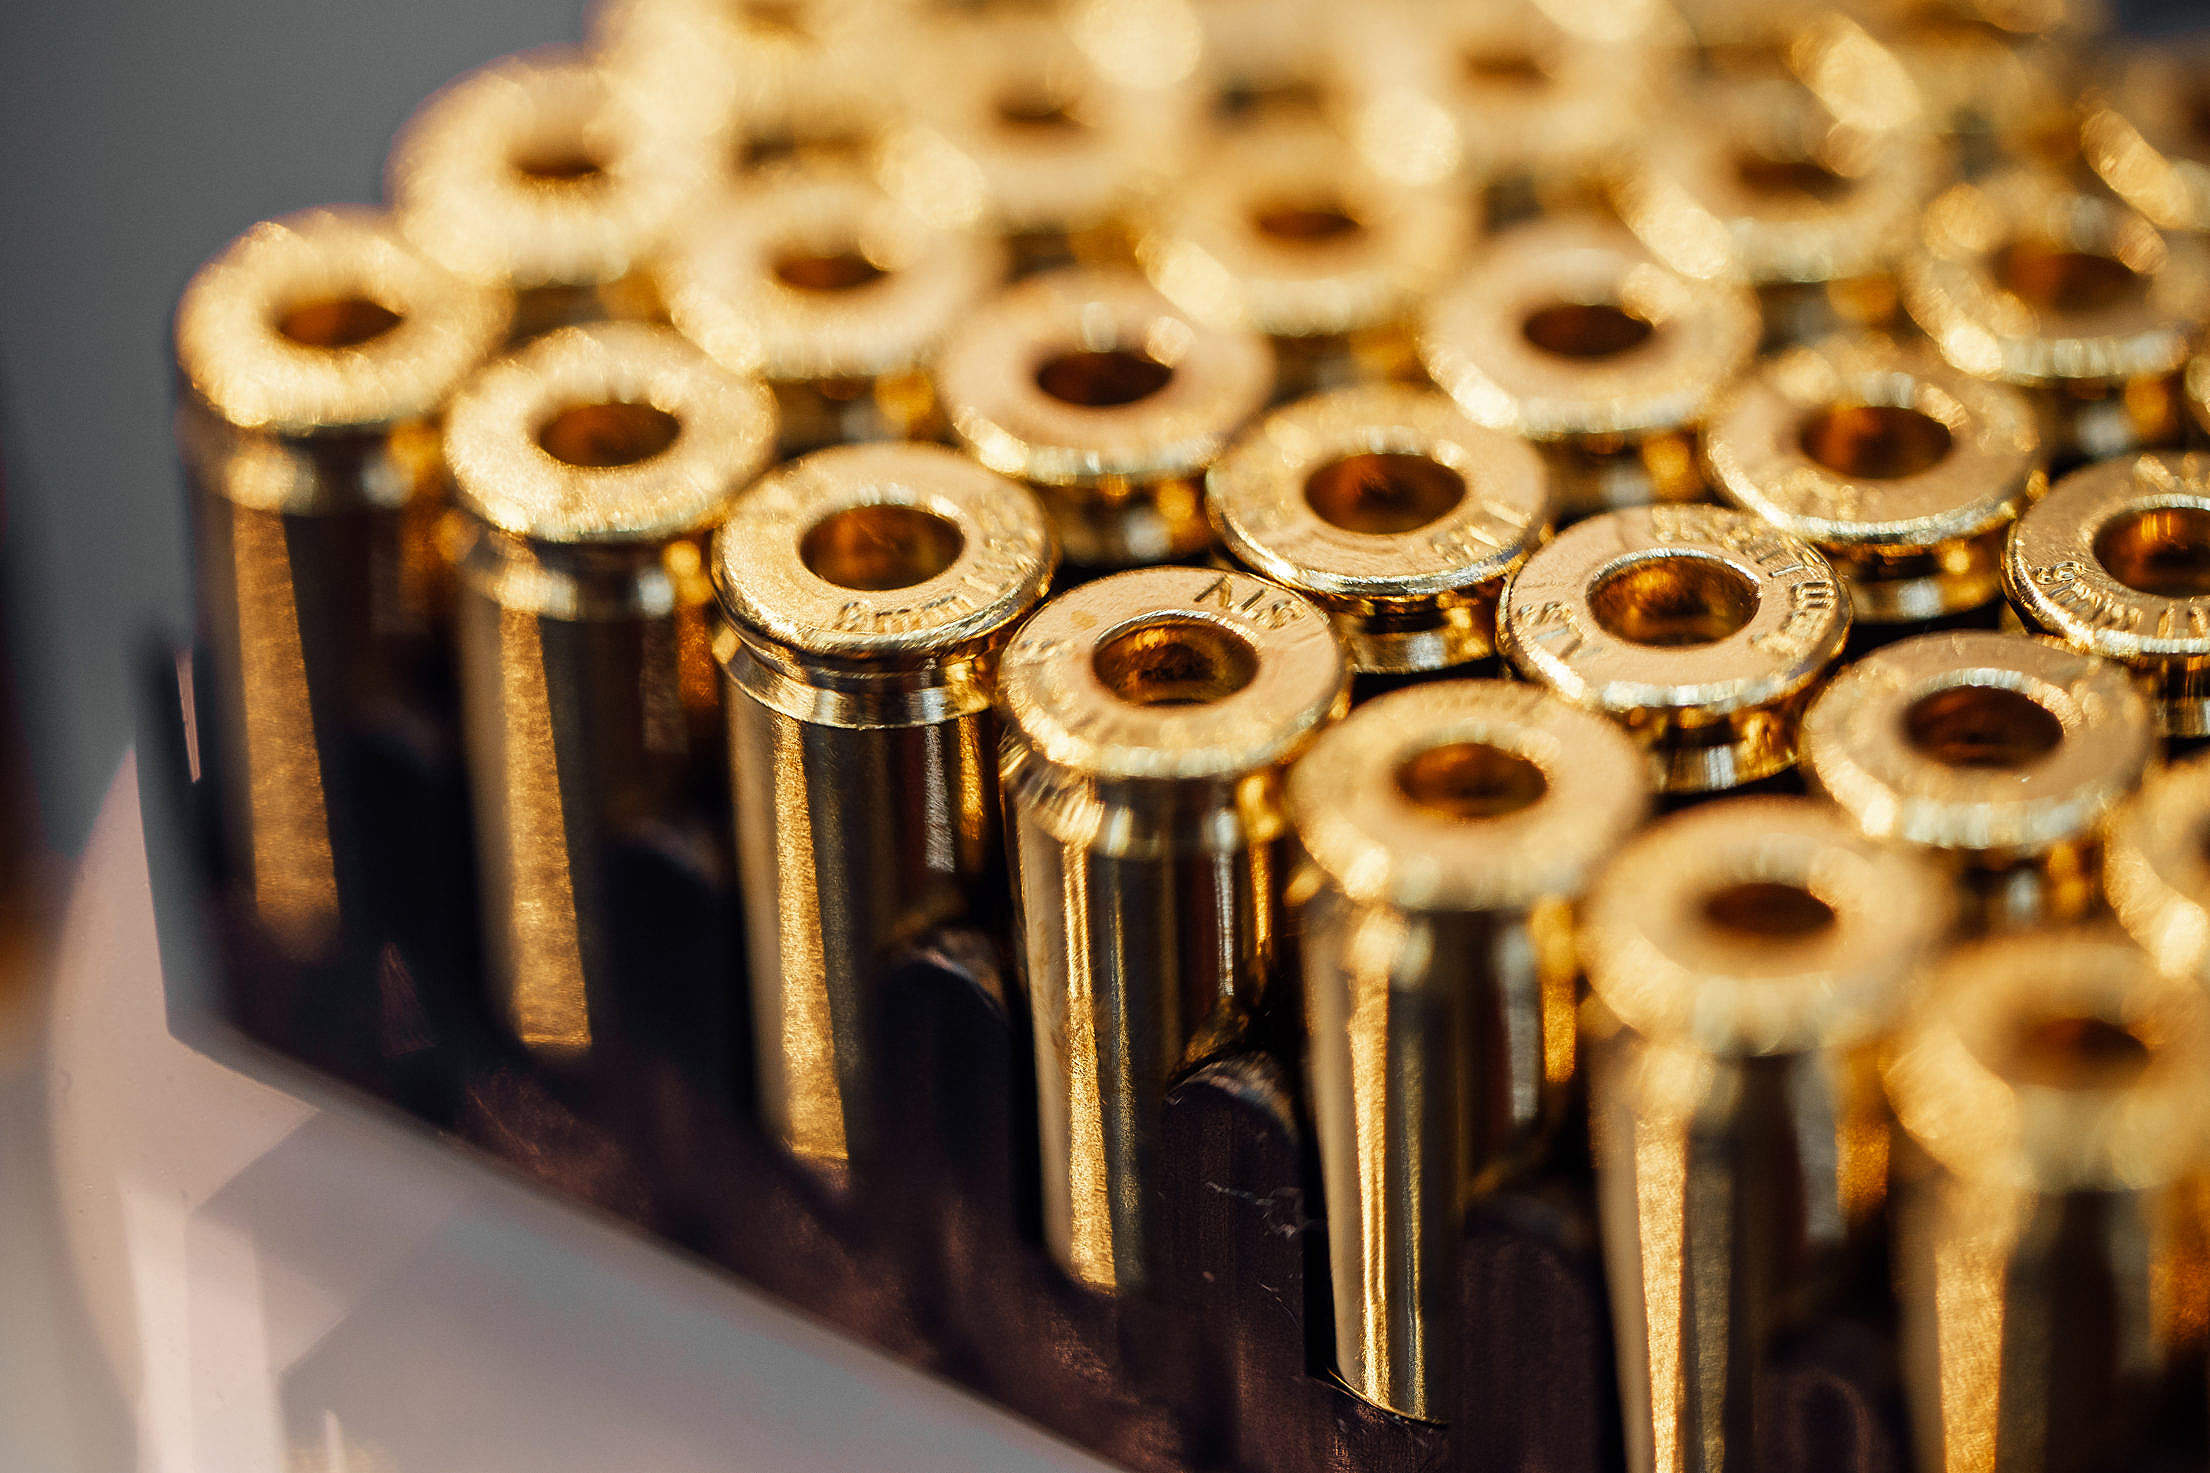 Ammunition for Handgun Weapons Free Stock Photo